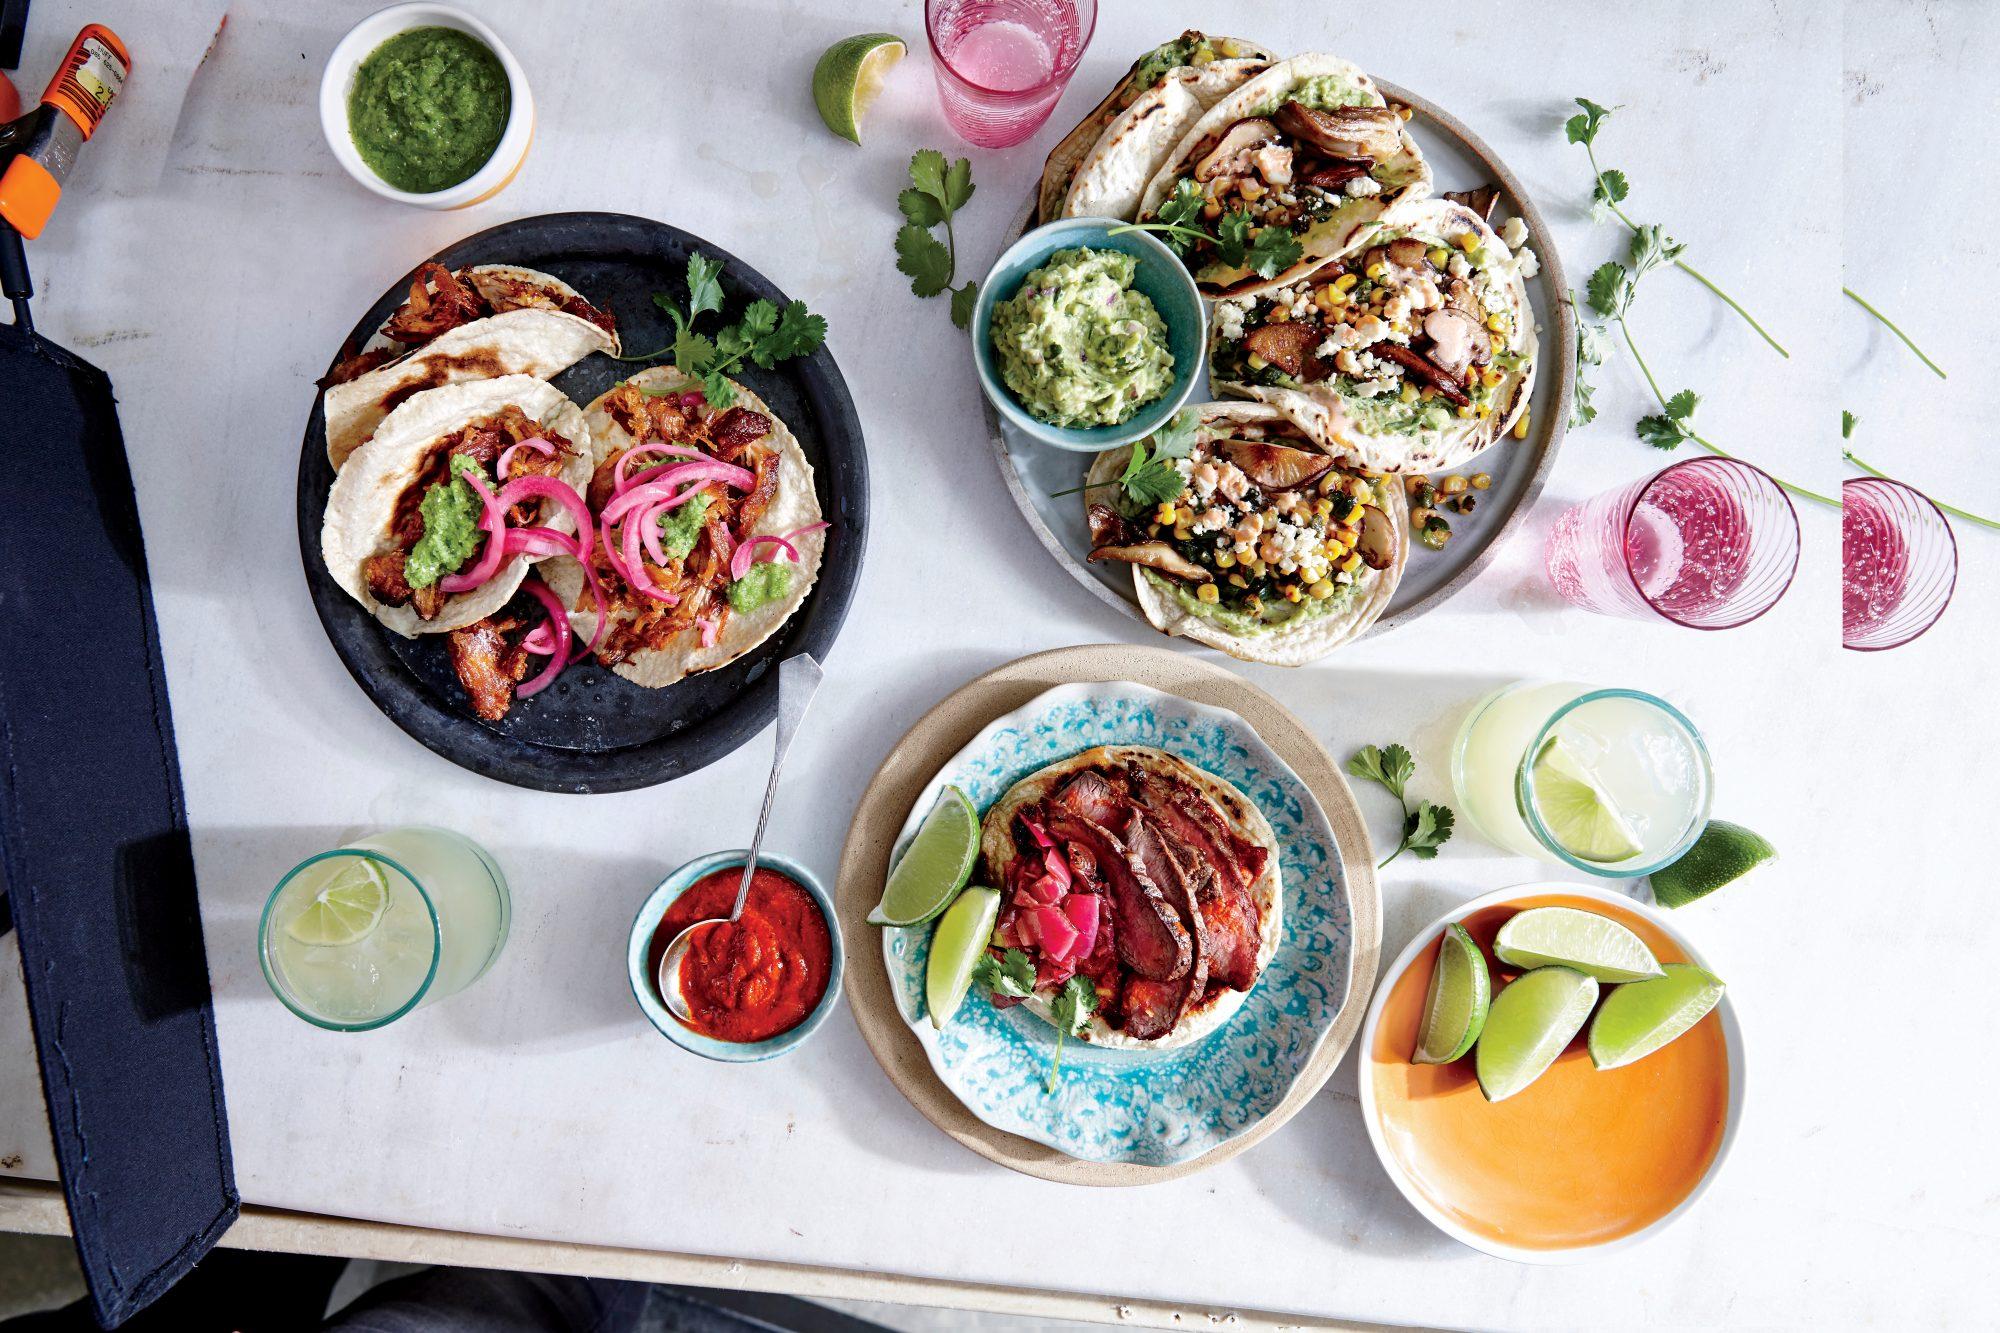 Mushroom and Charred Corn Tacos with Guacamole